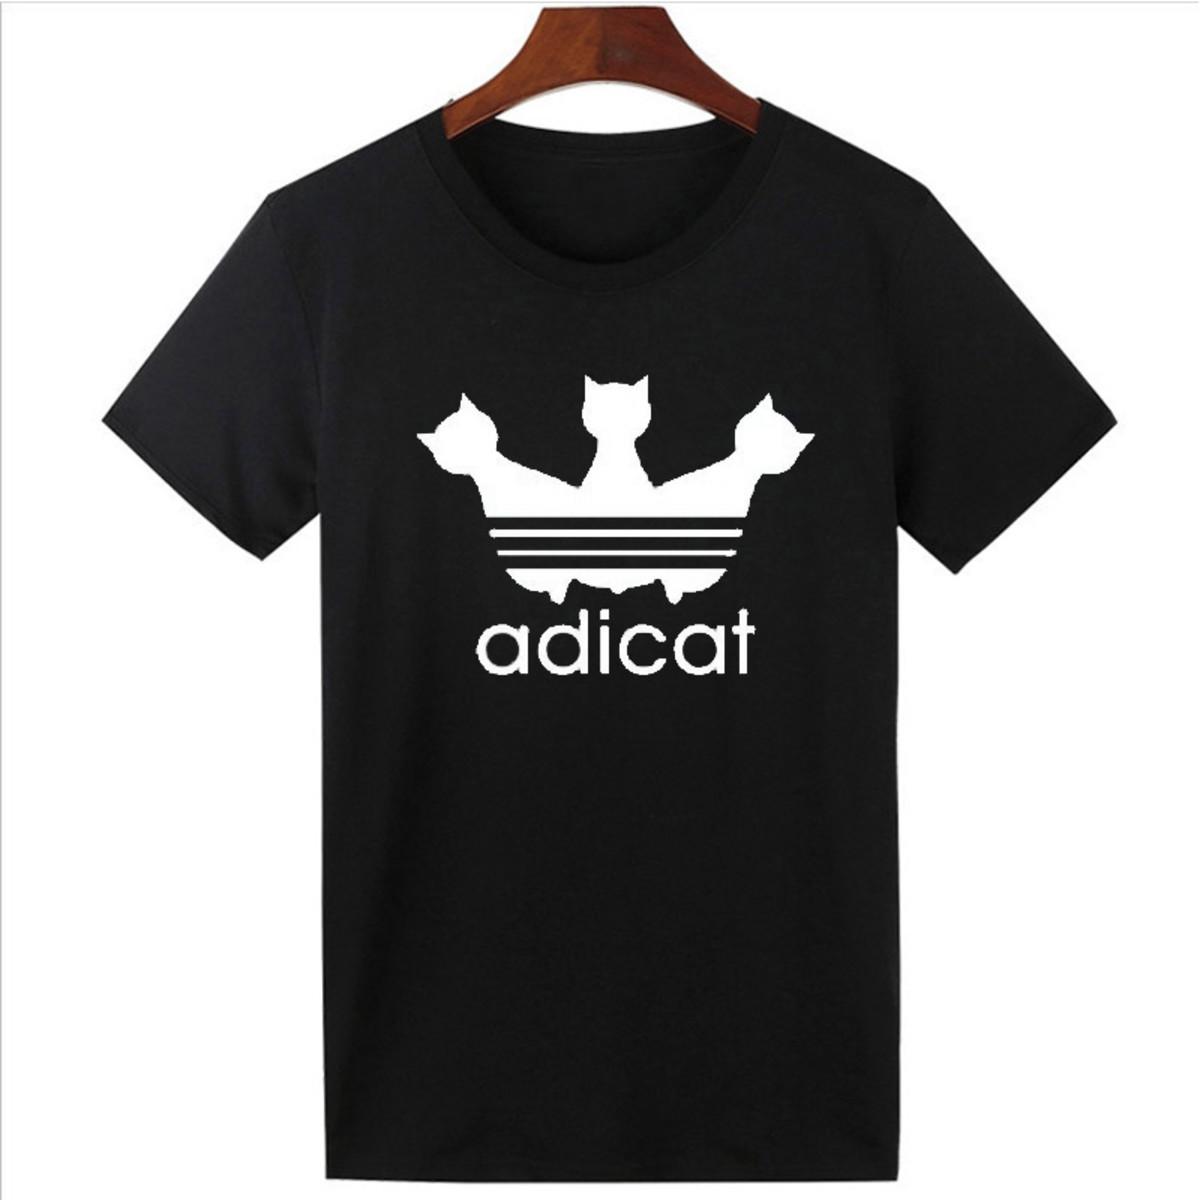 bf3b213a6 Camiseta Feminina Gata Blogueira no Elo7 | West Kings Design (CFE9EF)